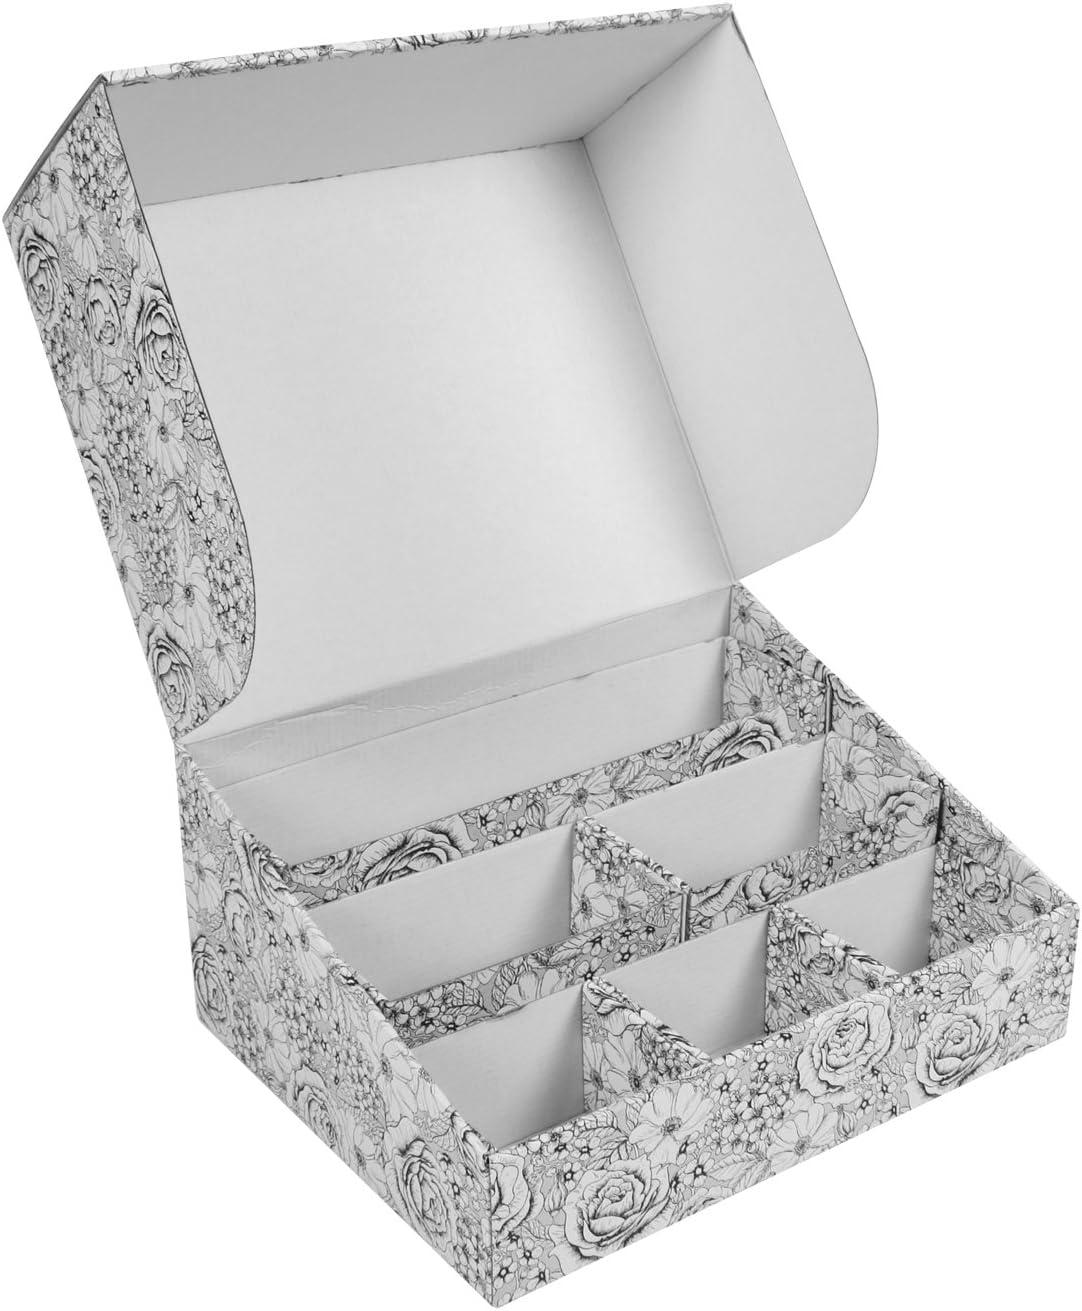 Deco Caja de almacenamiento, organizador, caja de cartón, Bix, oficina mapa antiguo, flores: Amazon.es: Hogar